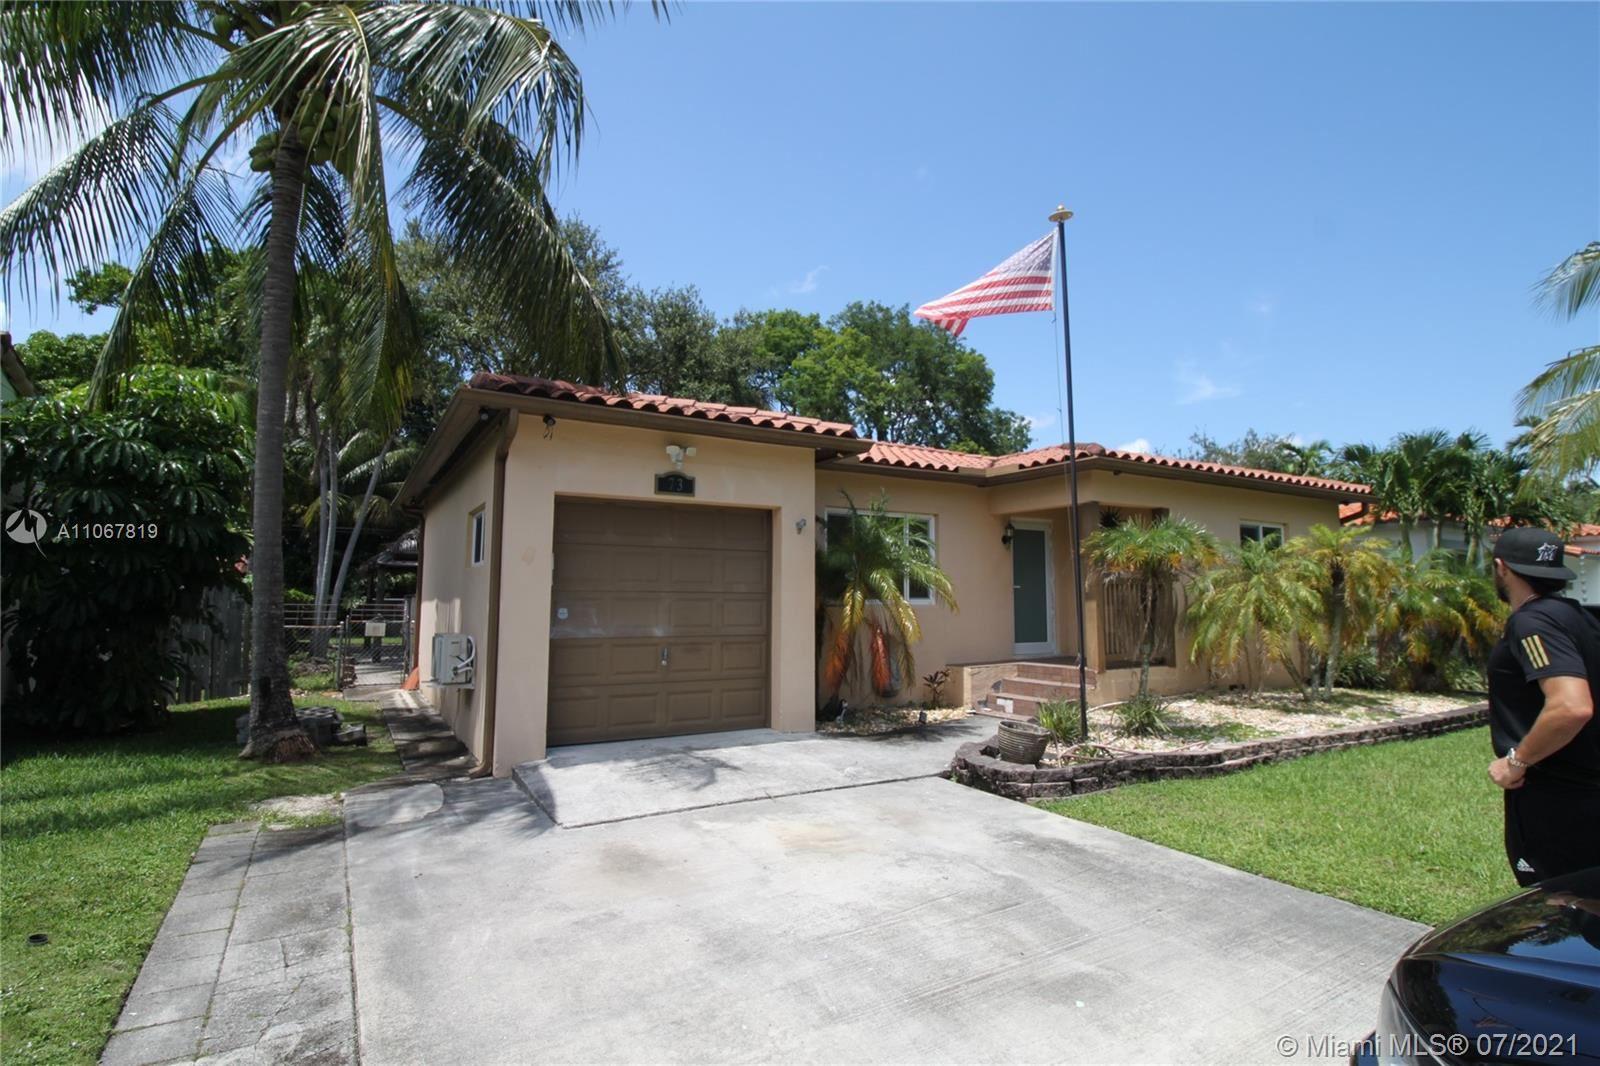 73 Whitethorn Dr, Miami Springs, FL 33166 - #: A11067819